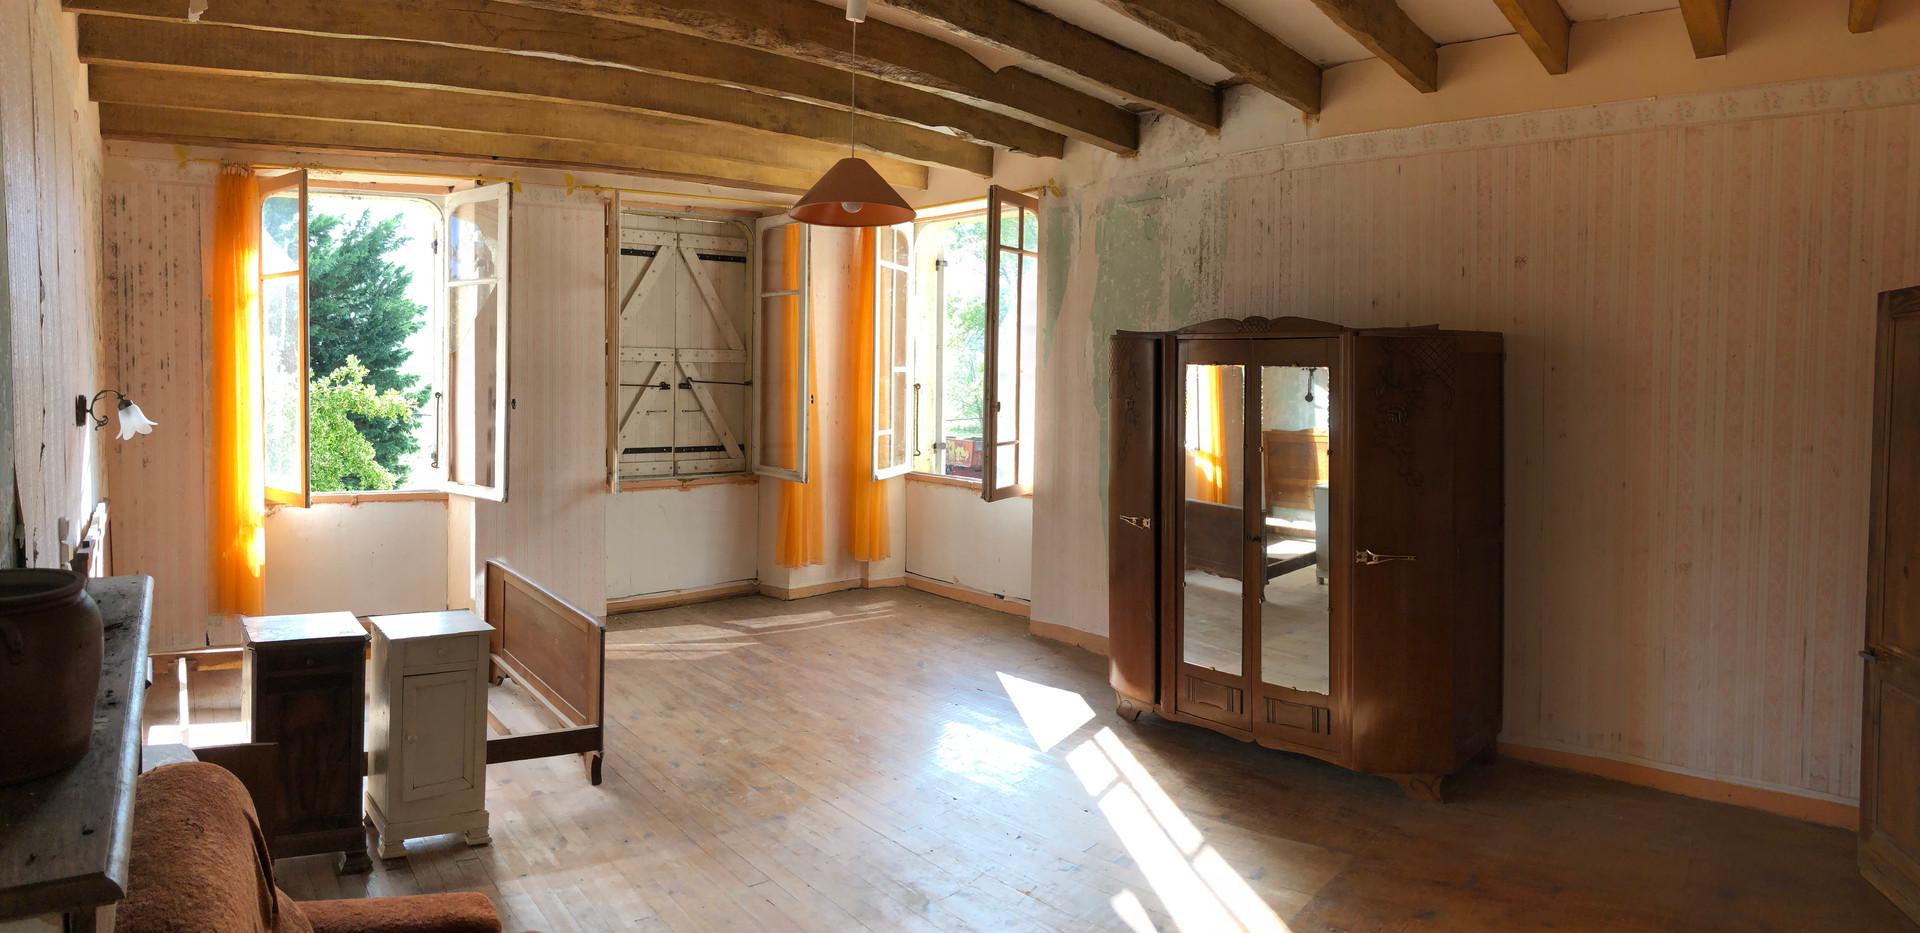 Grande_chambre_étage_2.jpeg